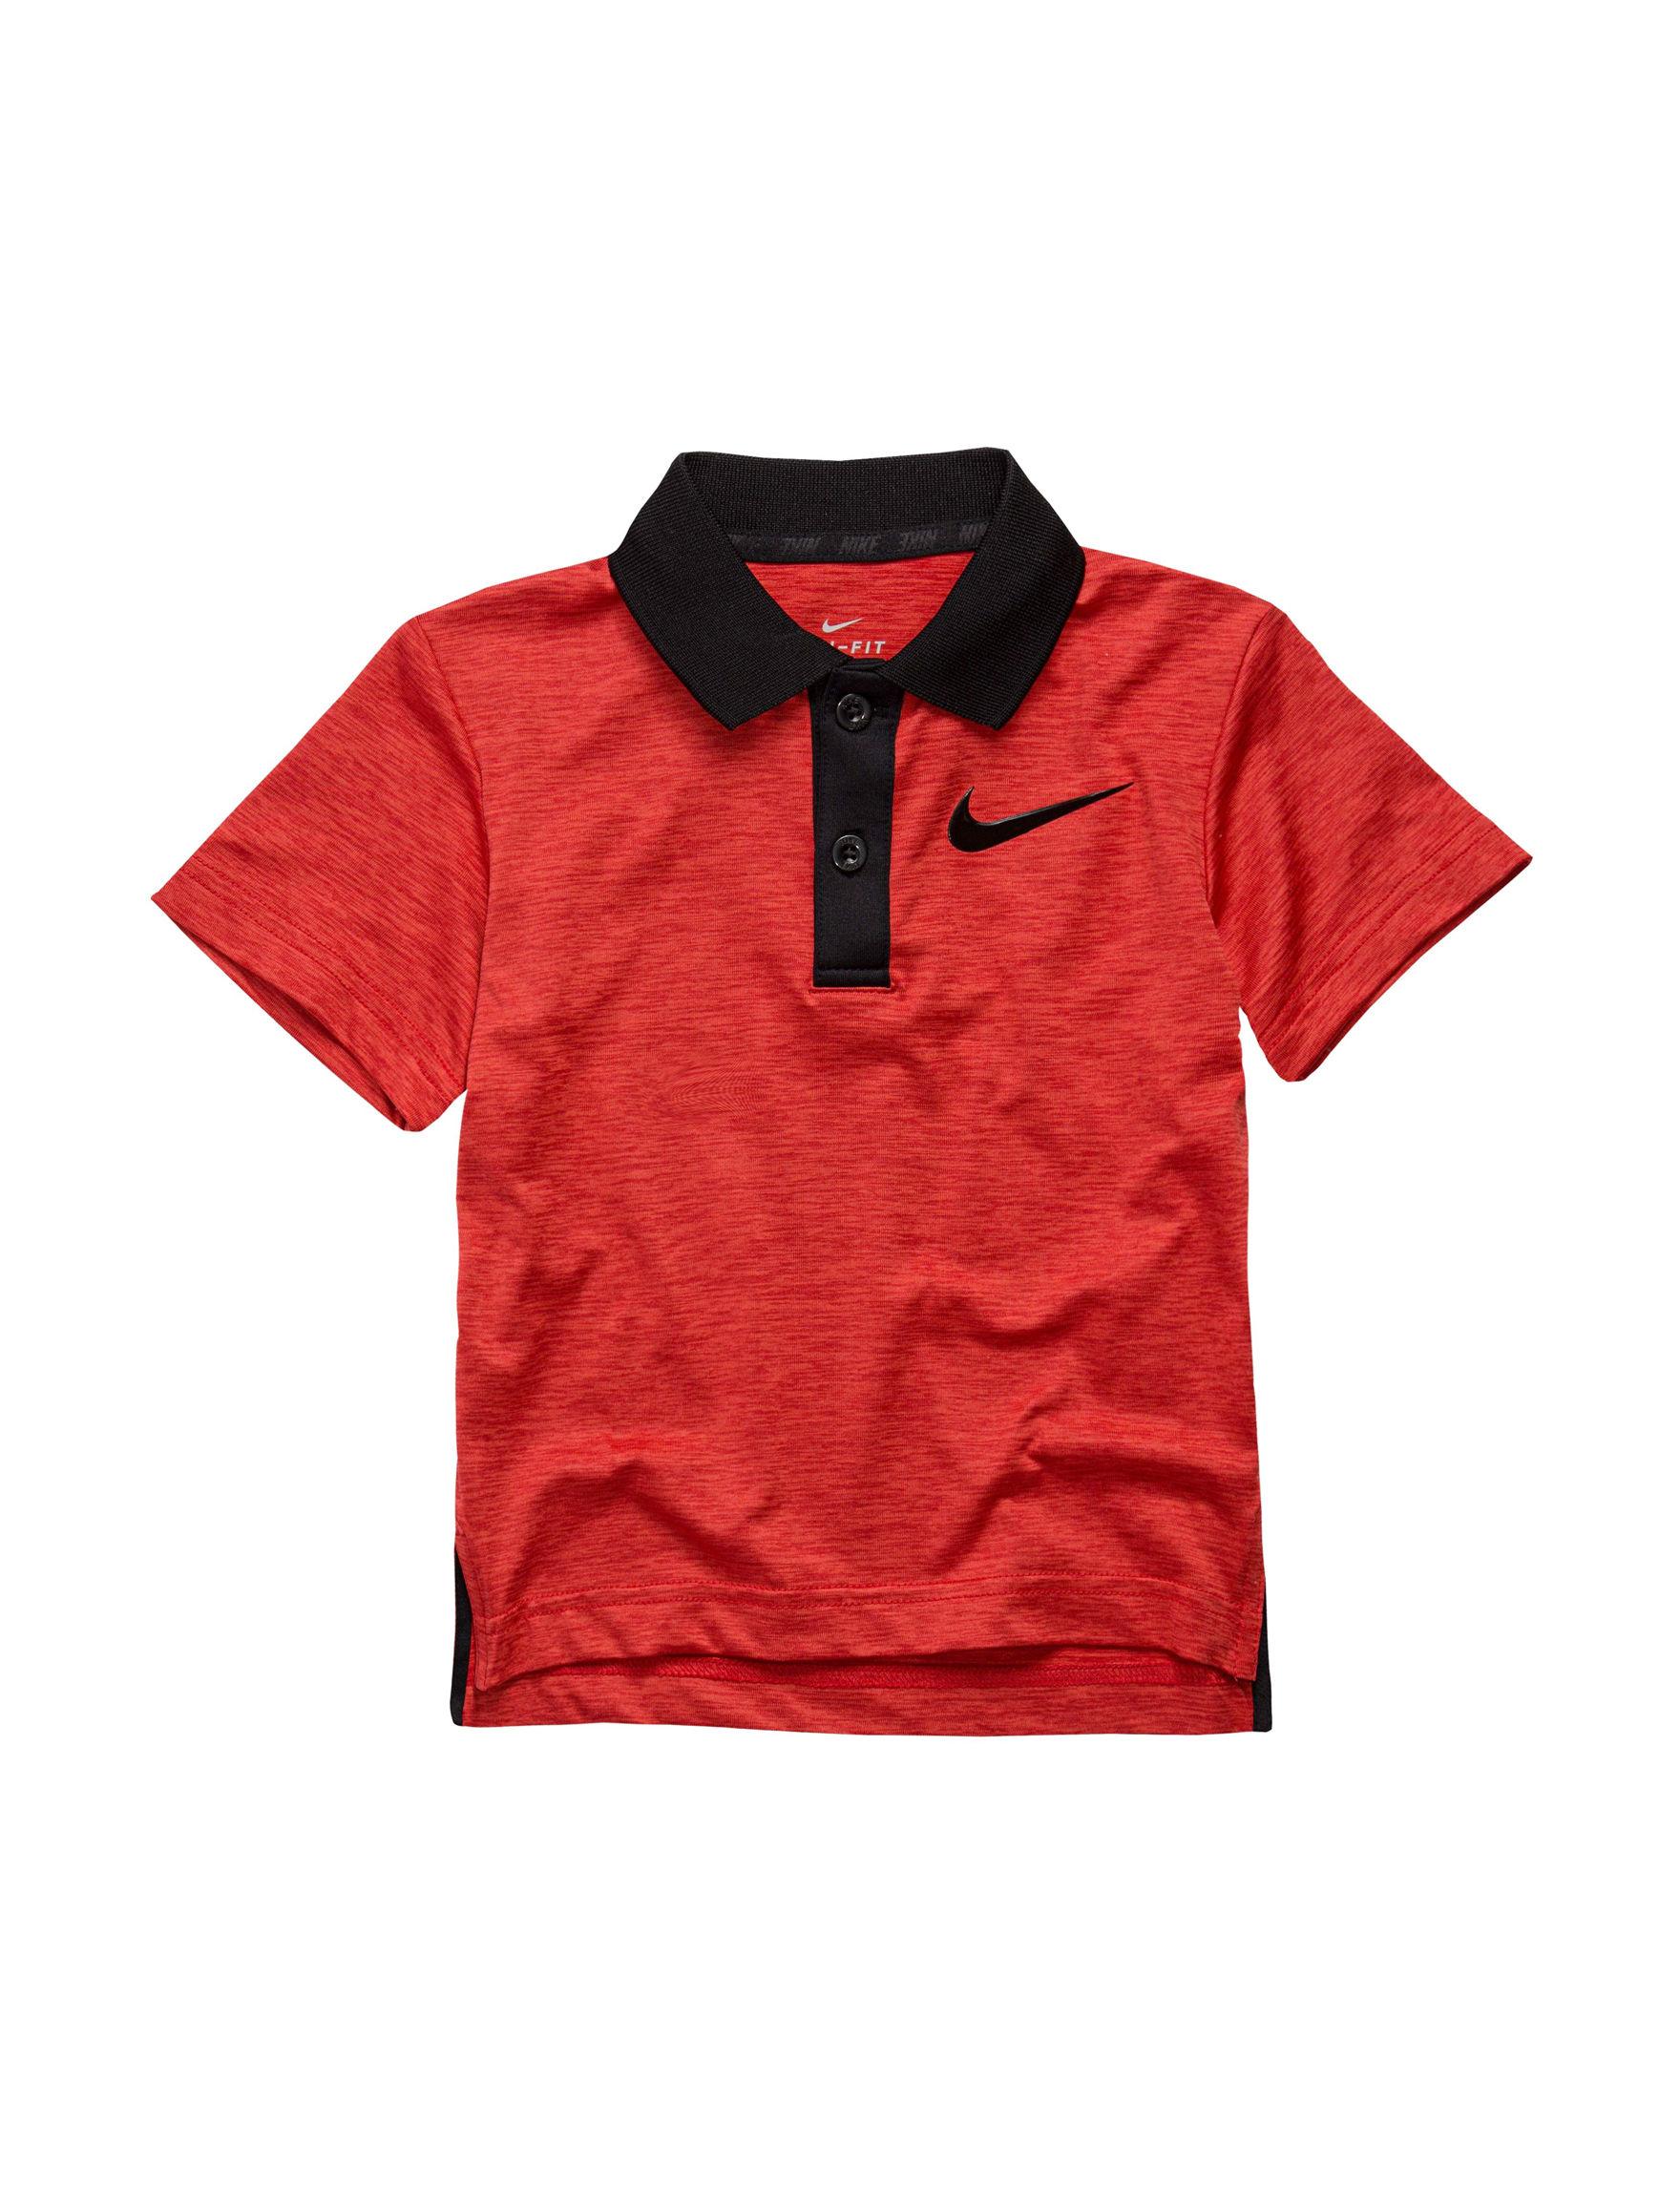 Nike Red Tees & Tanks